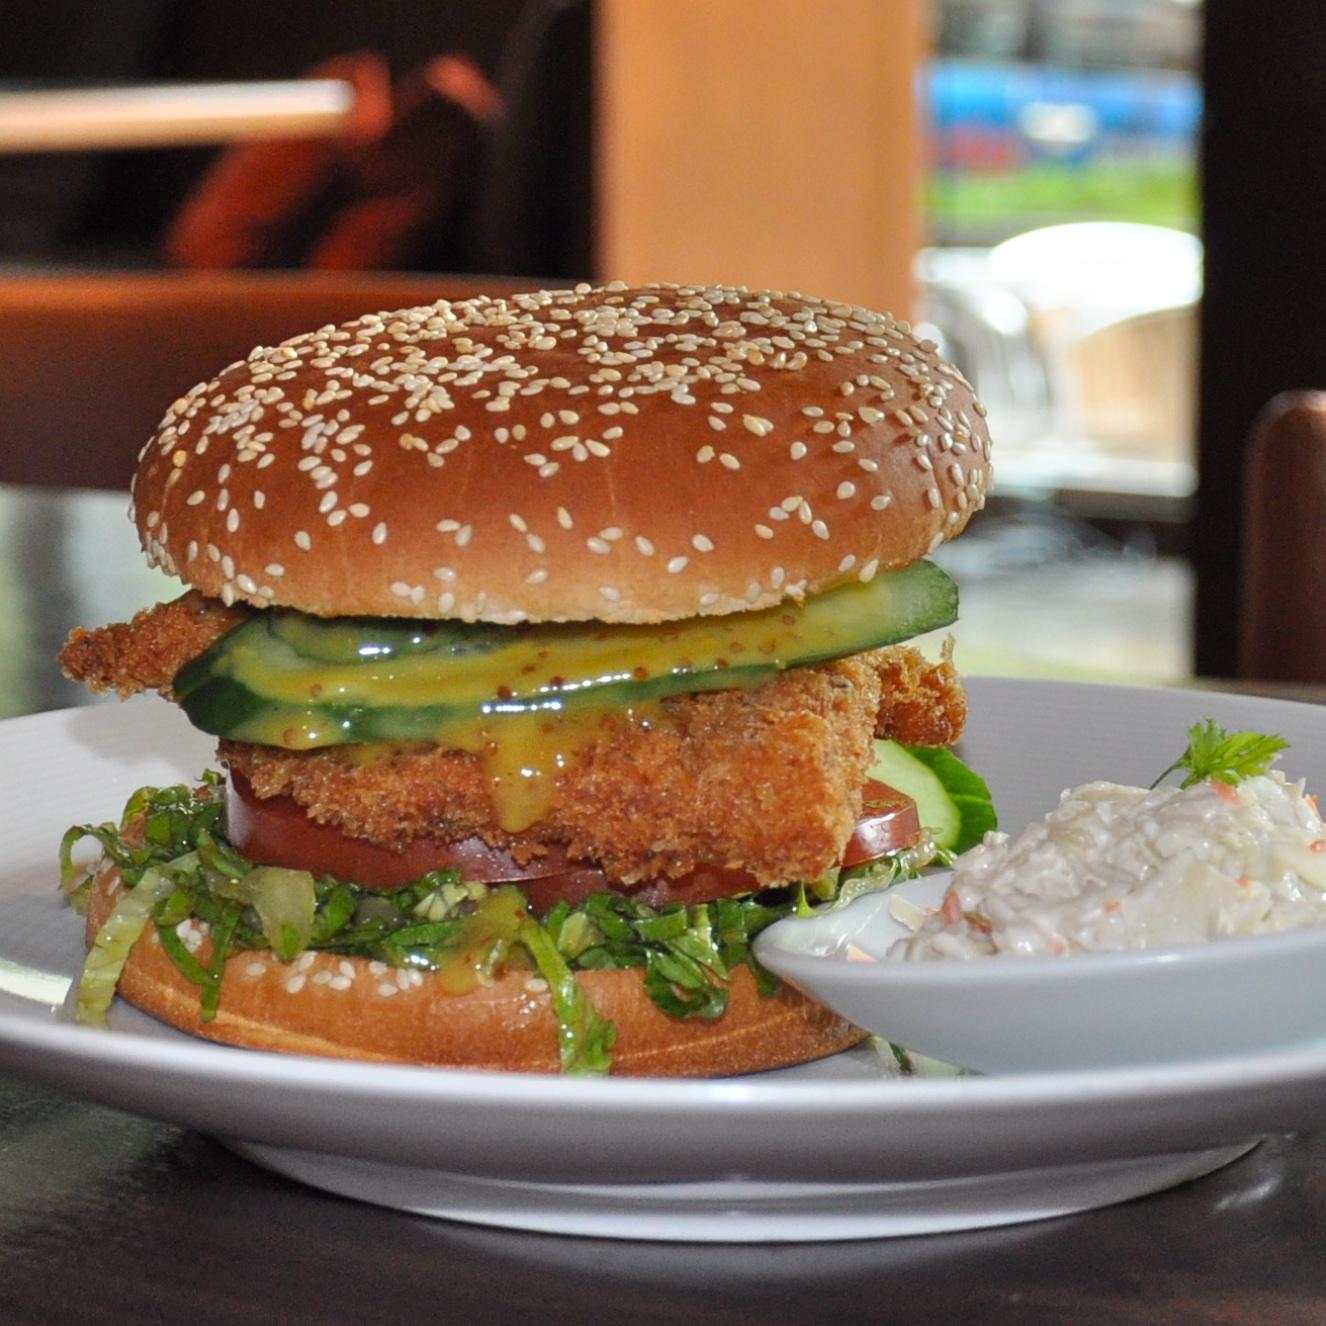 Tizian-Hyatt-Burger-essen-Chicken